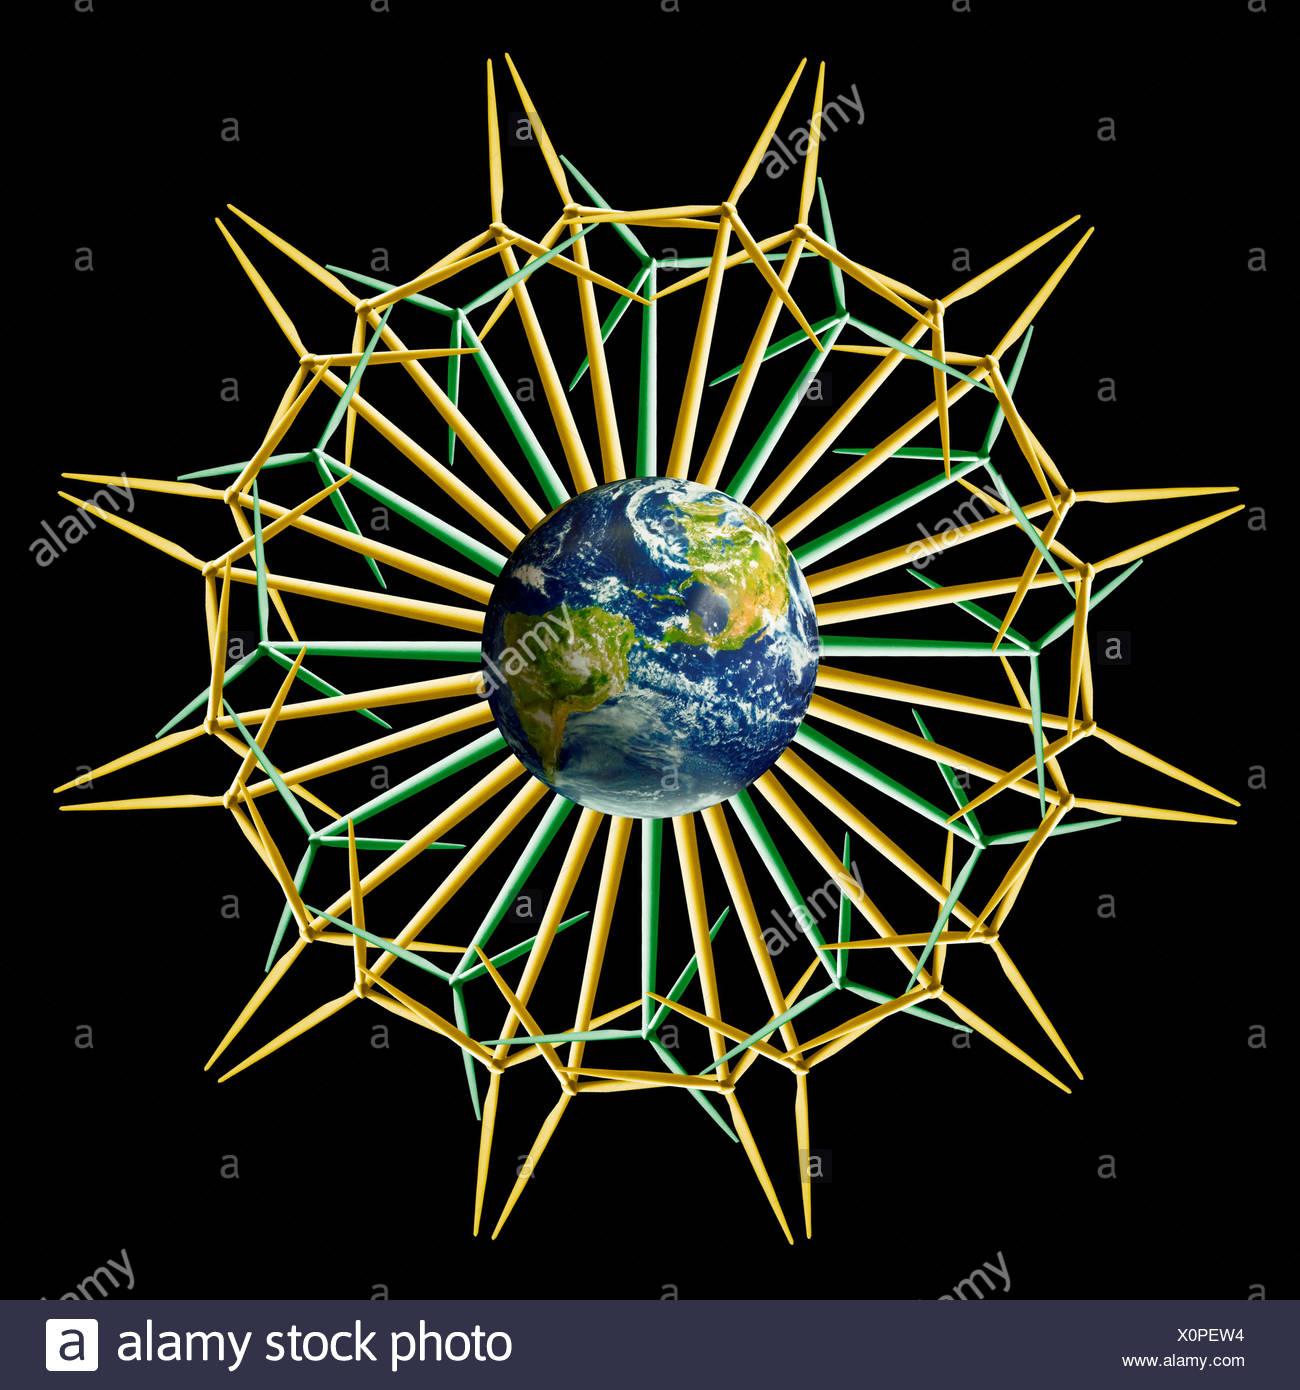 Earth Windtower Mandala, Flower Version - Stock Image